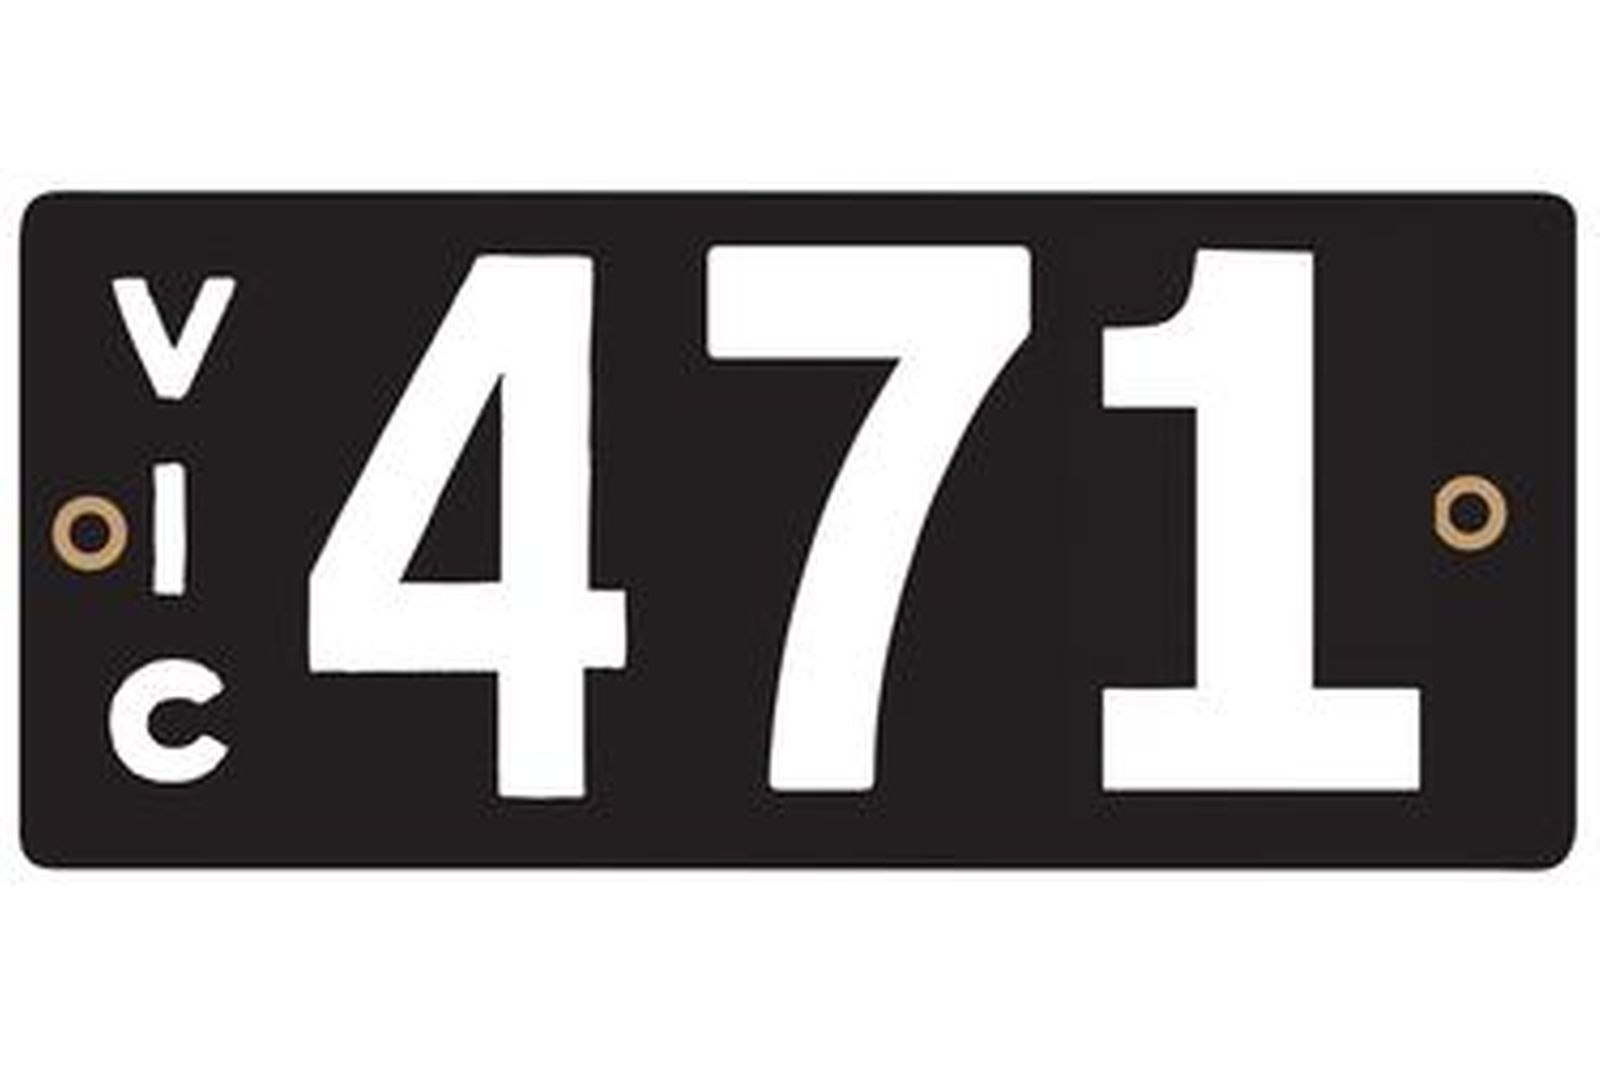 Victorian Heritage Plate '471'